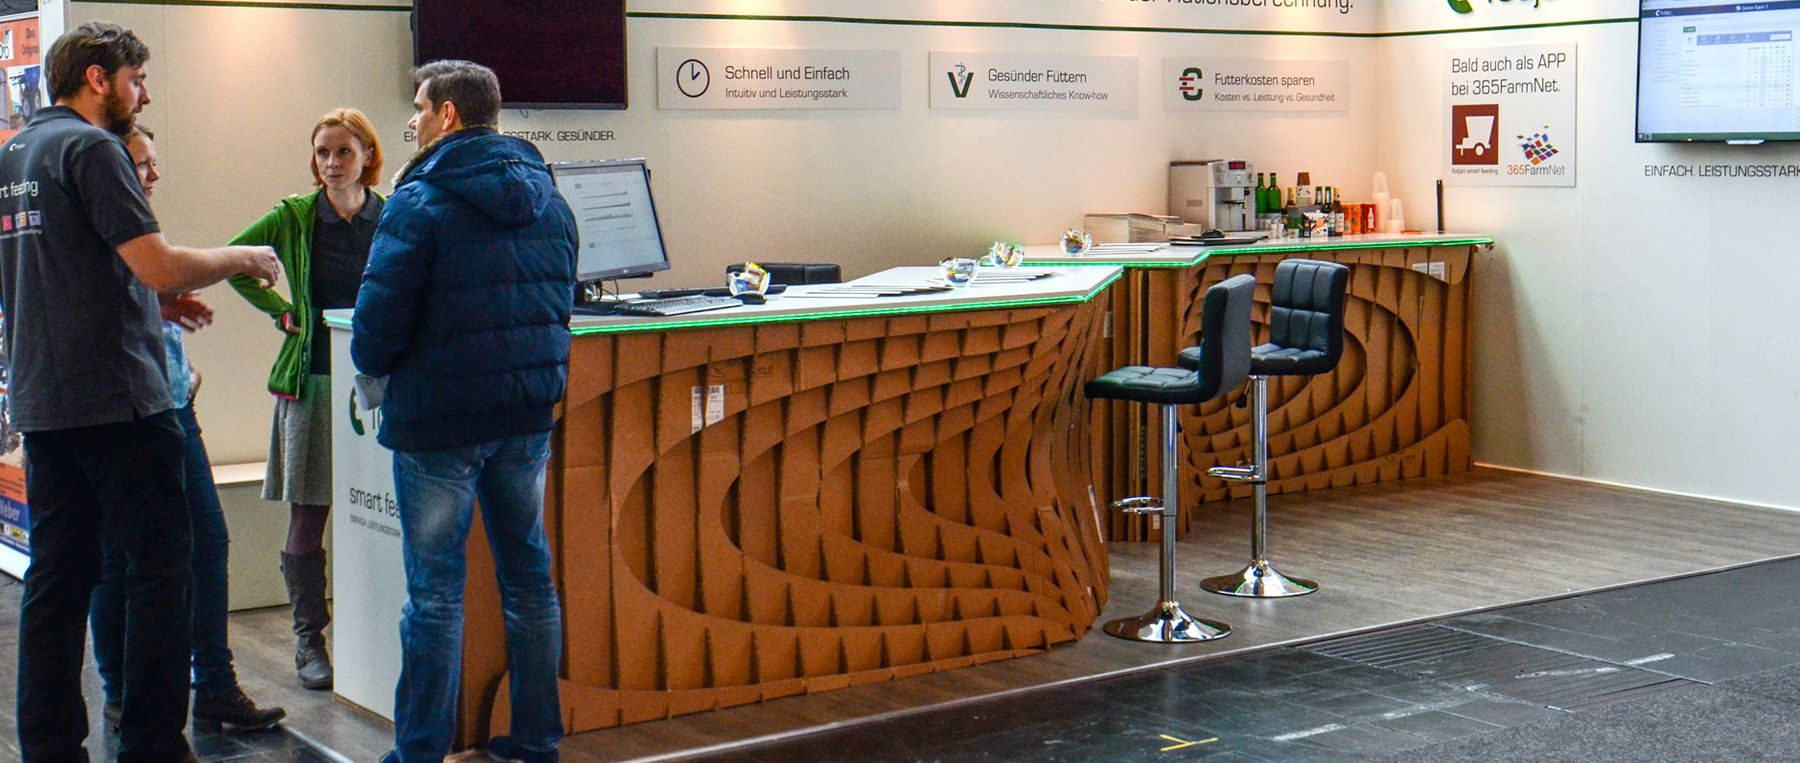 cardboard-furniture-möbel-aus-pappe-wellpappe-ecodesign-Ökomöbel